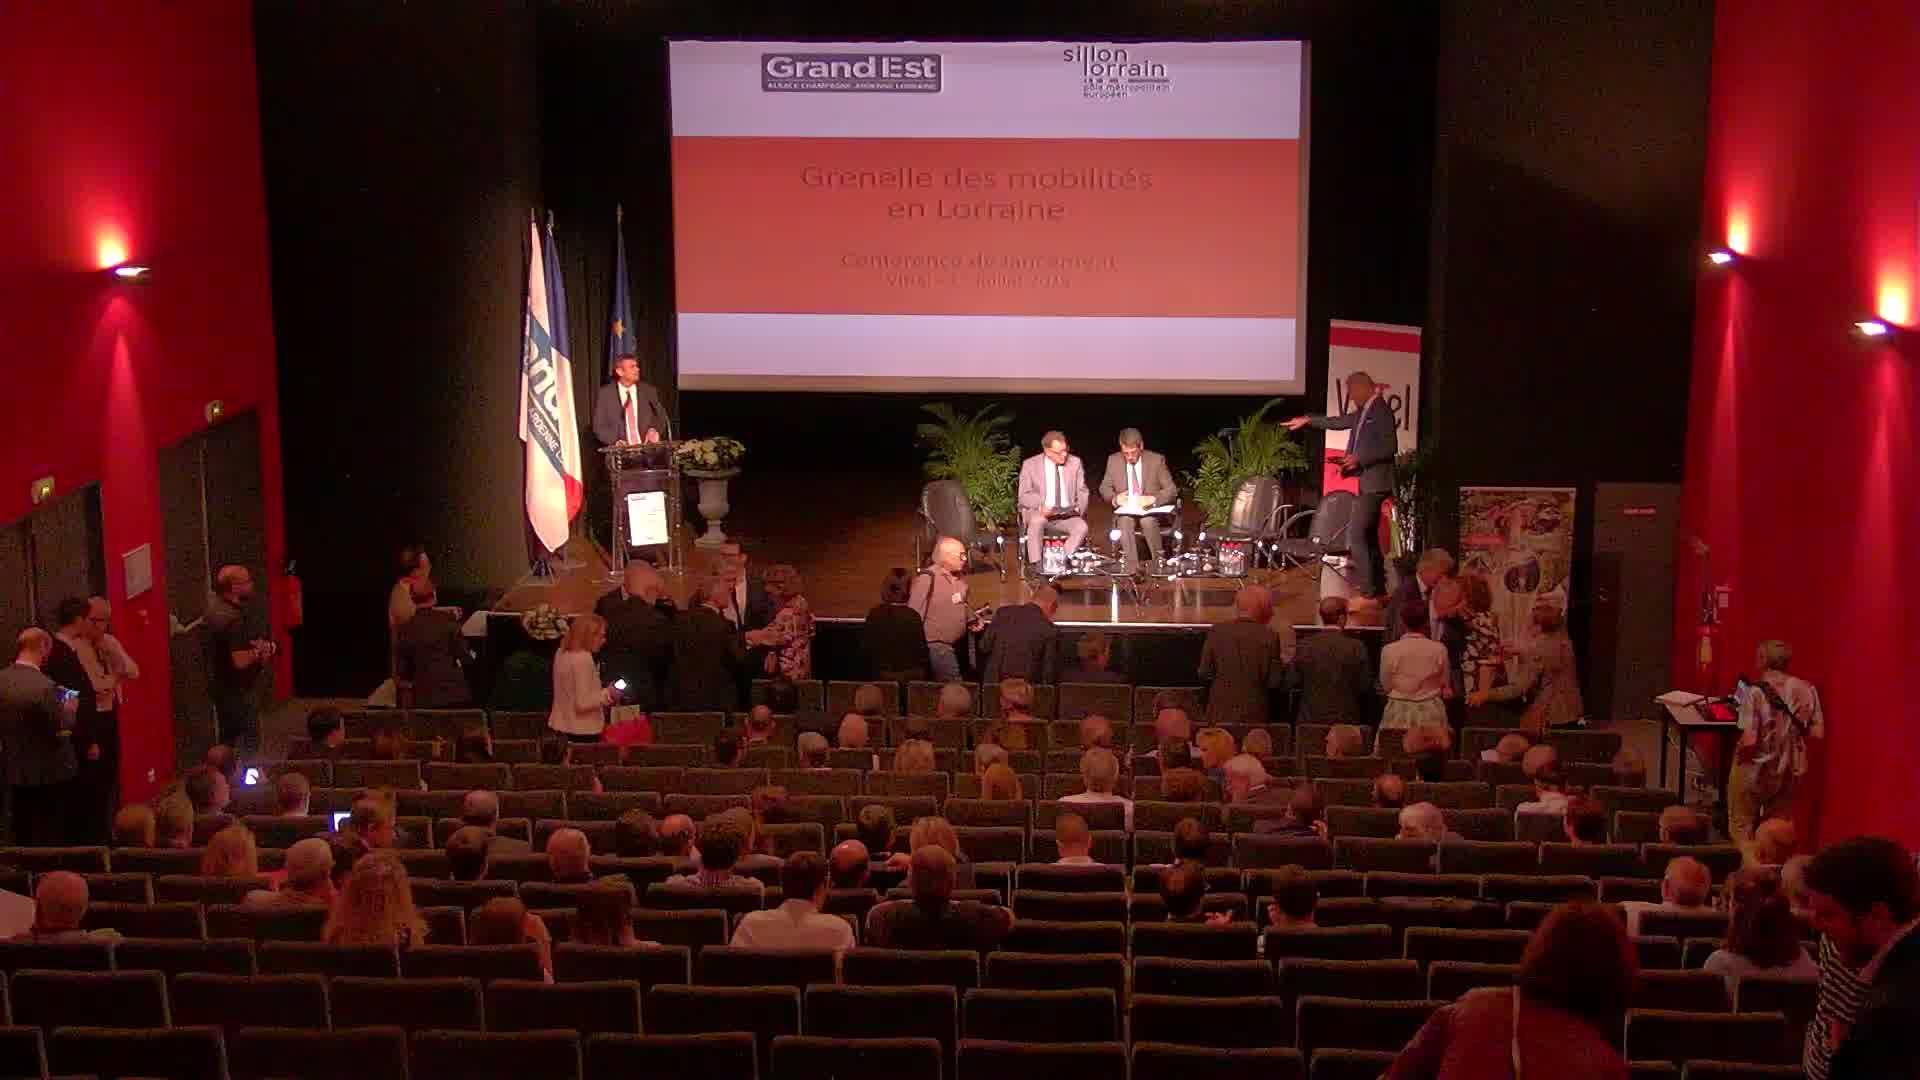 Grenelle des mobilités en Lorraine - 1er juillet 2019 - Vittel